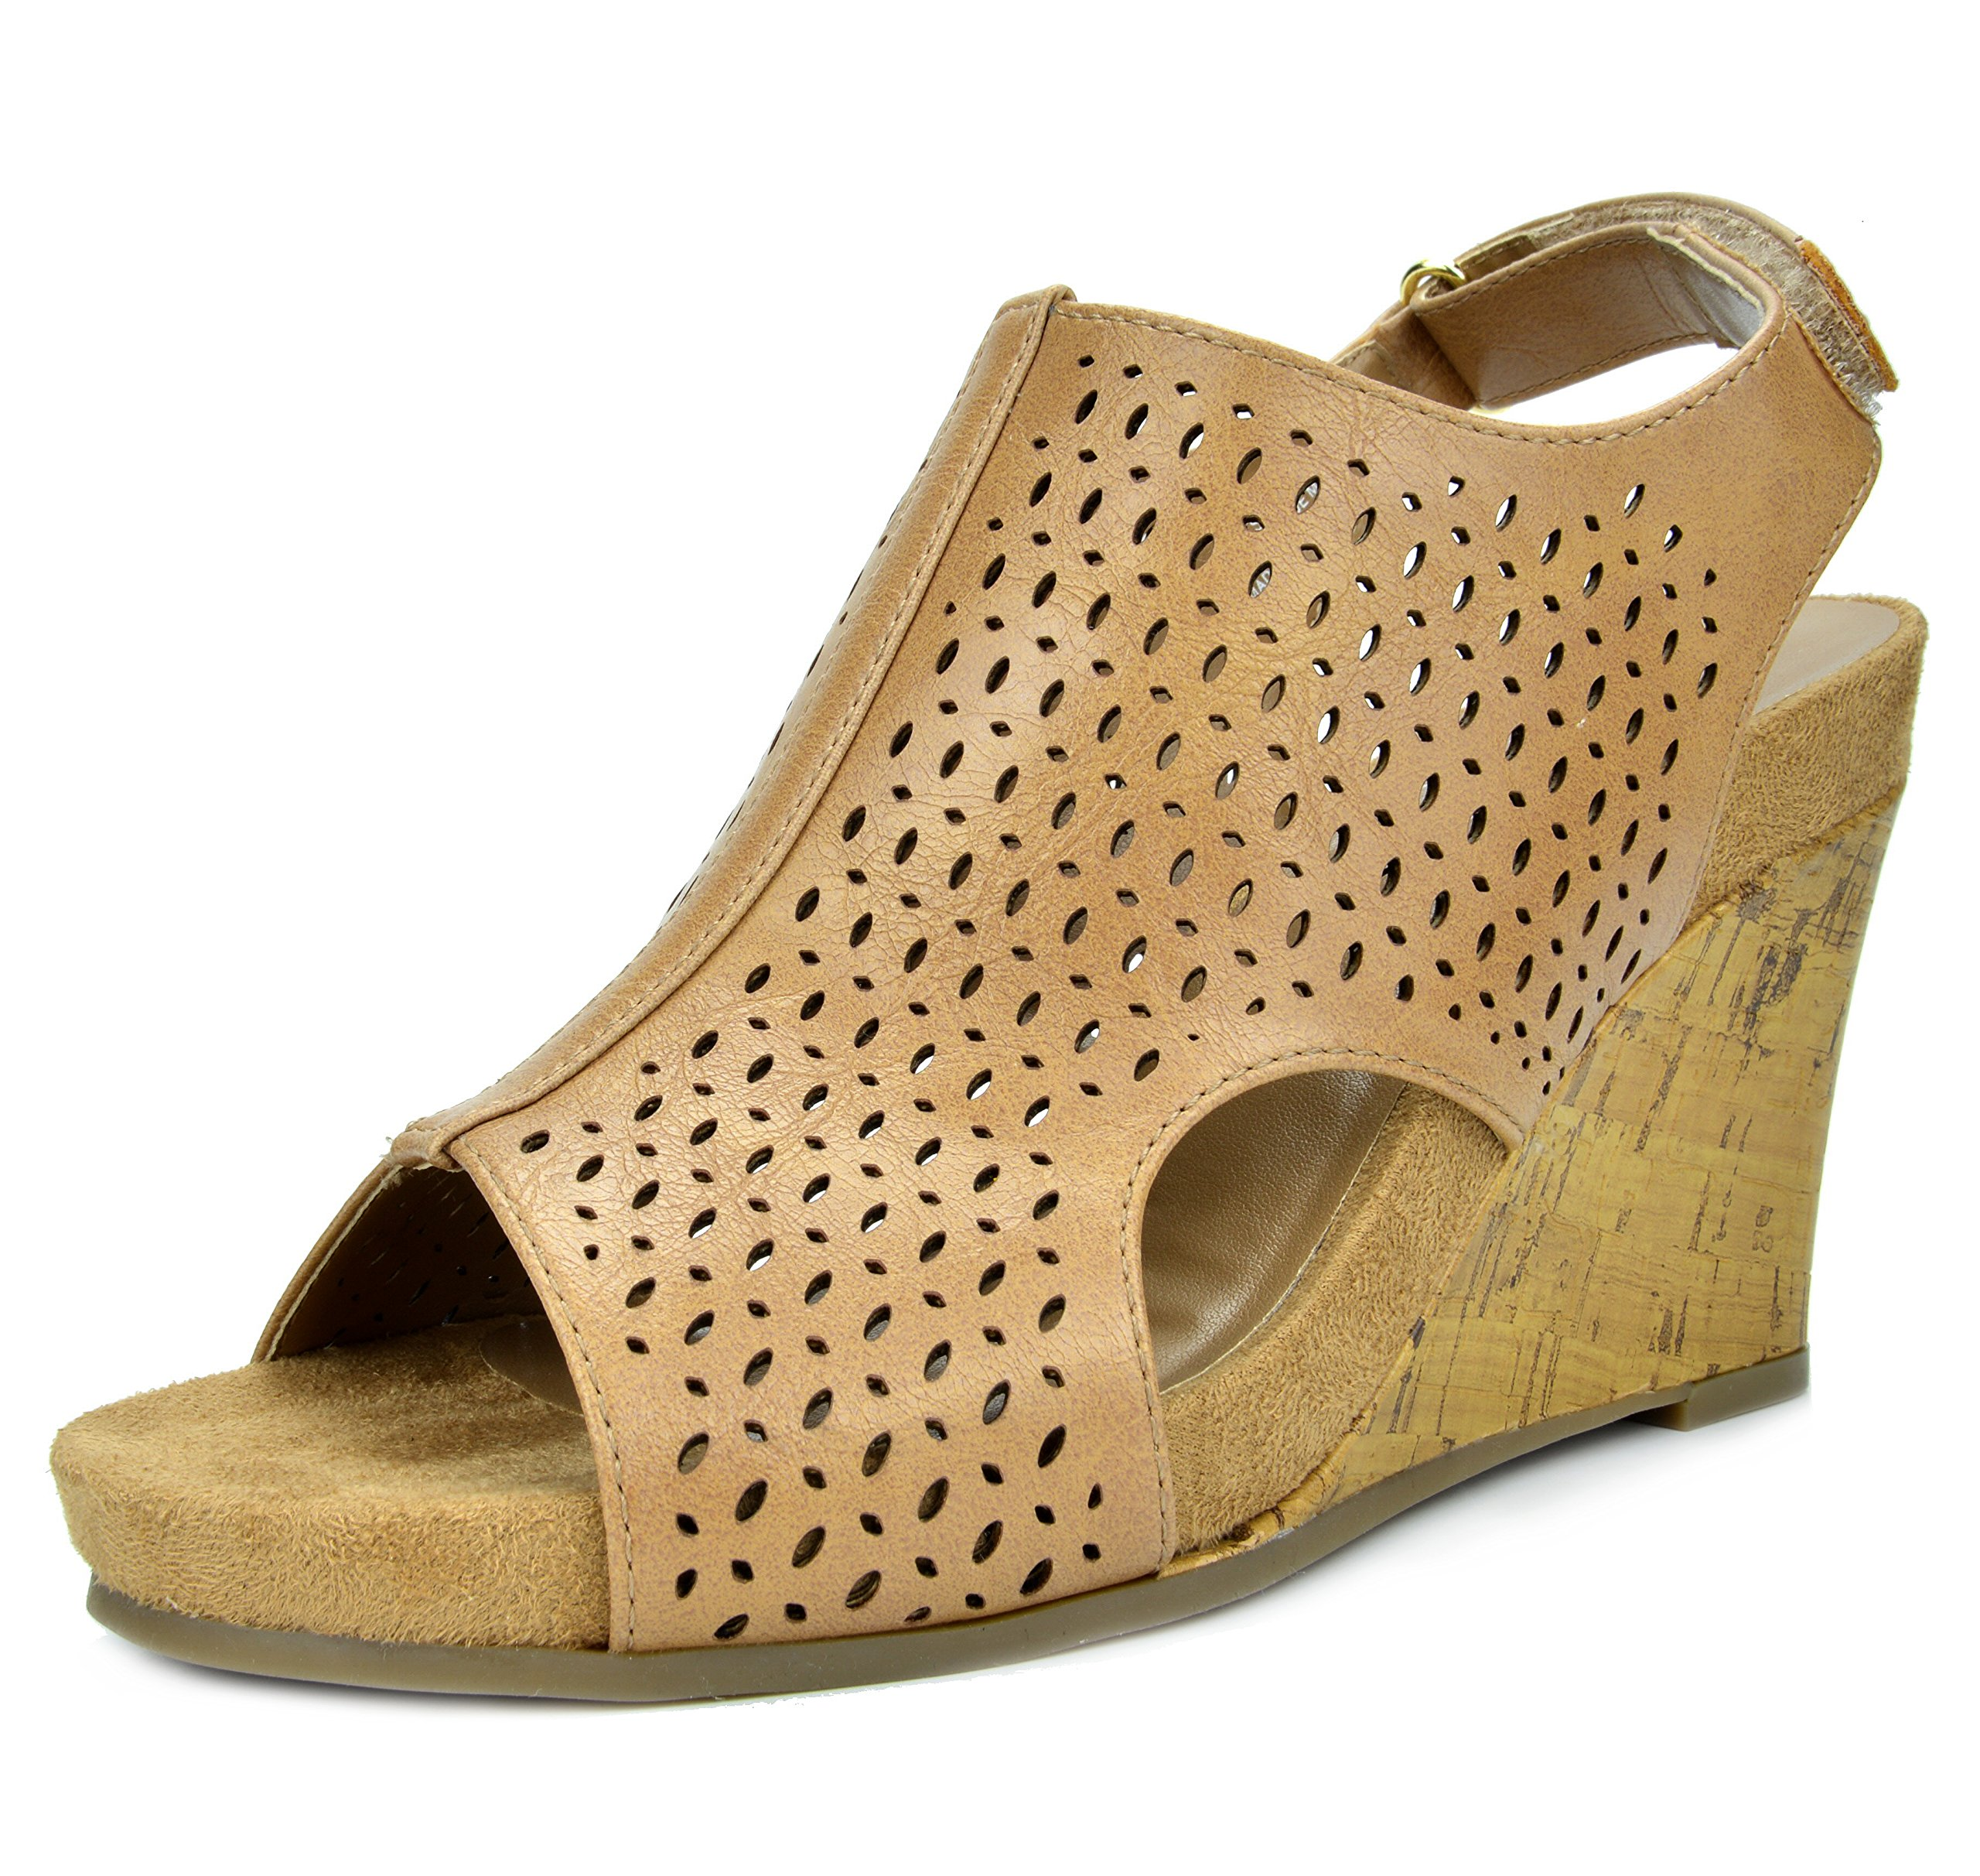 sandal lafely women womens clarks comfort wedge sandals comforter rosen s